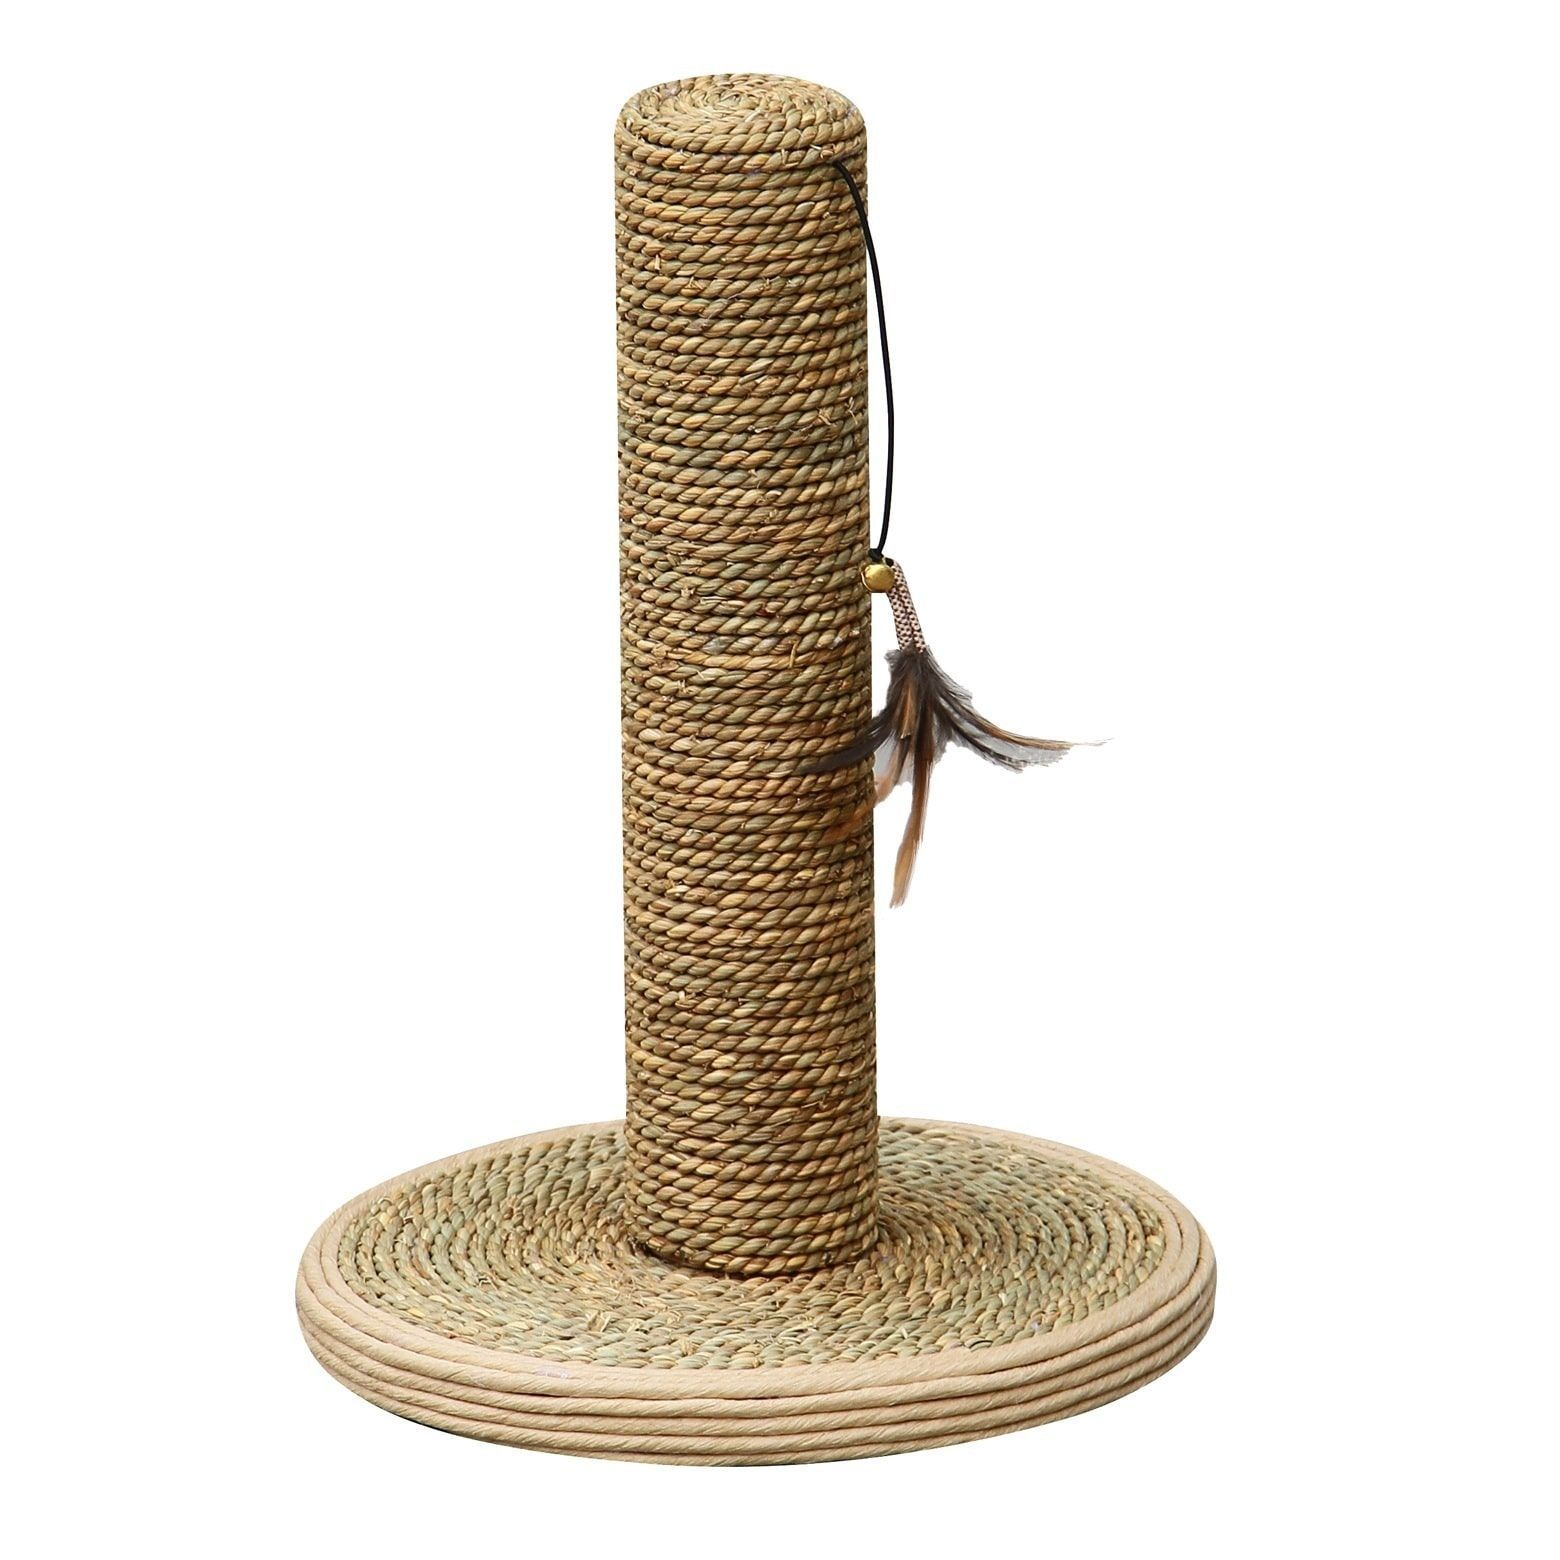 PetPals Seagrass Cat Scratching Post Natural Tan